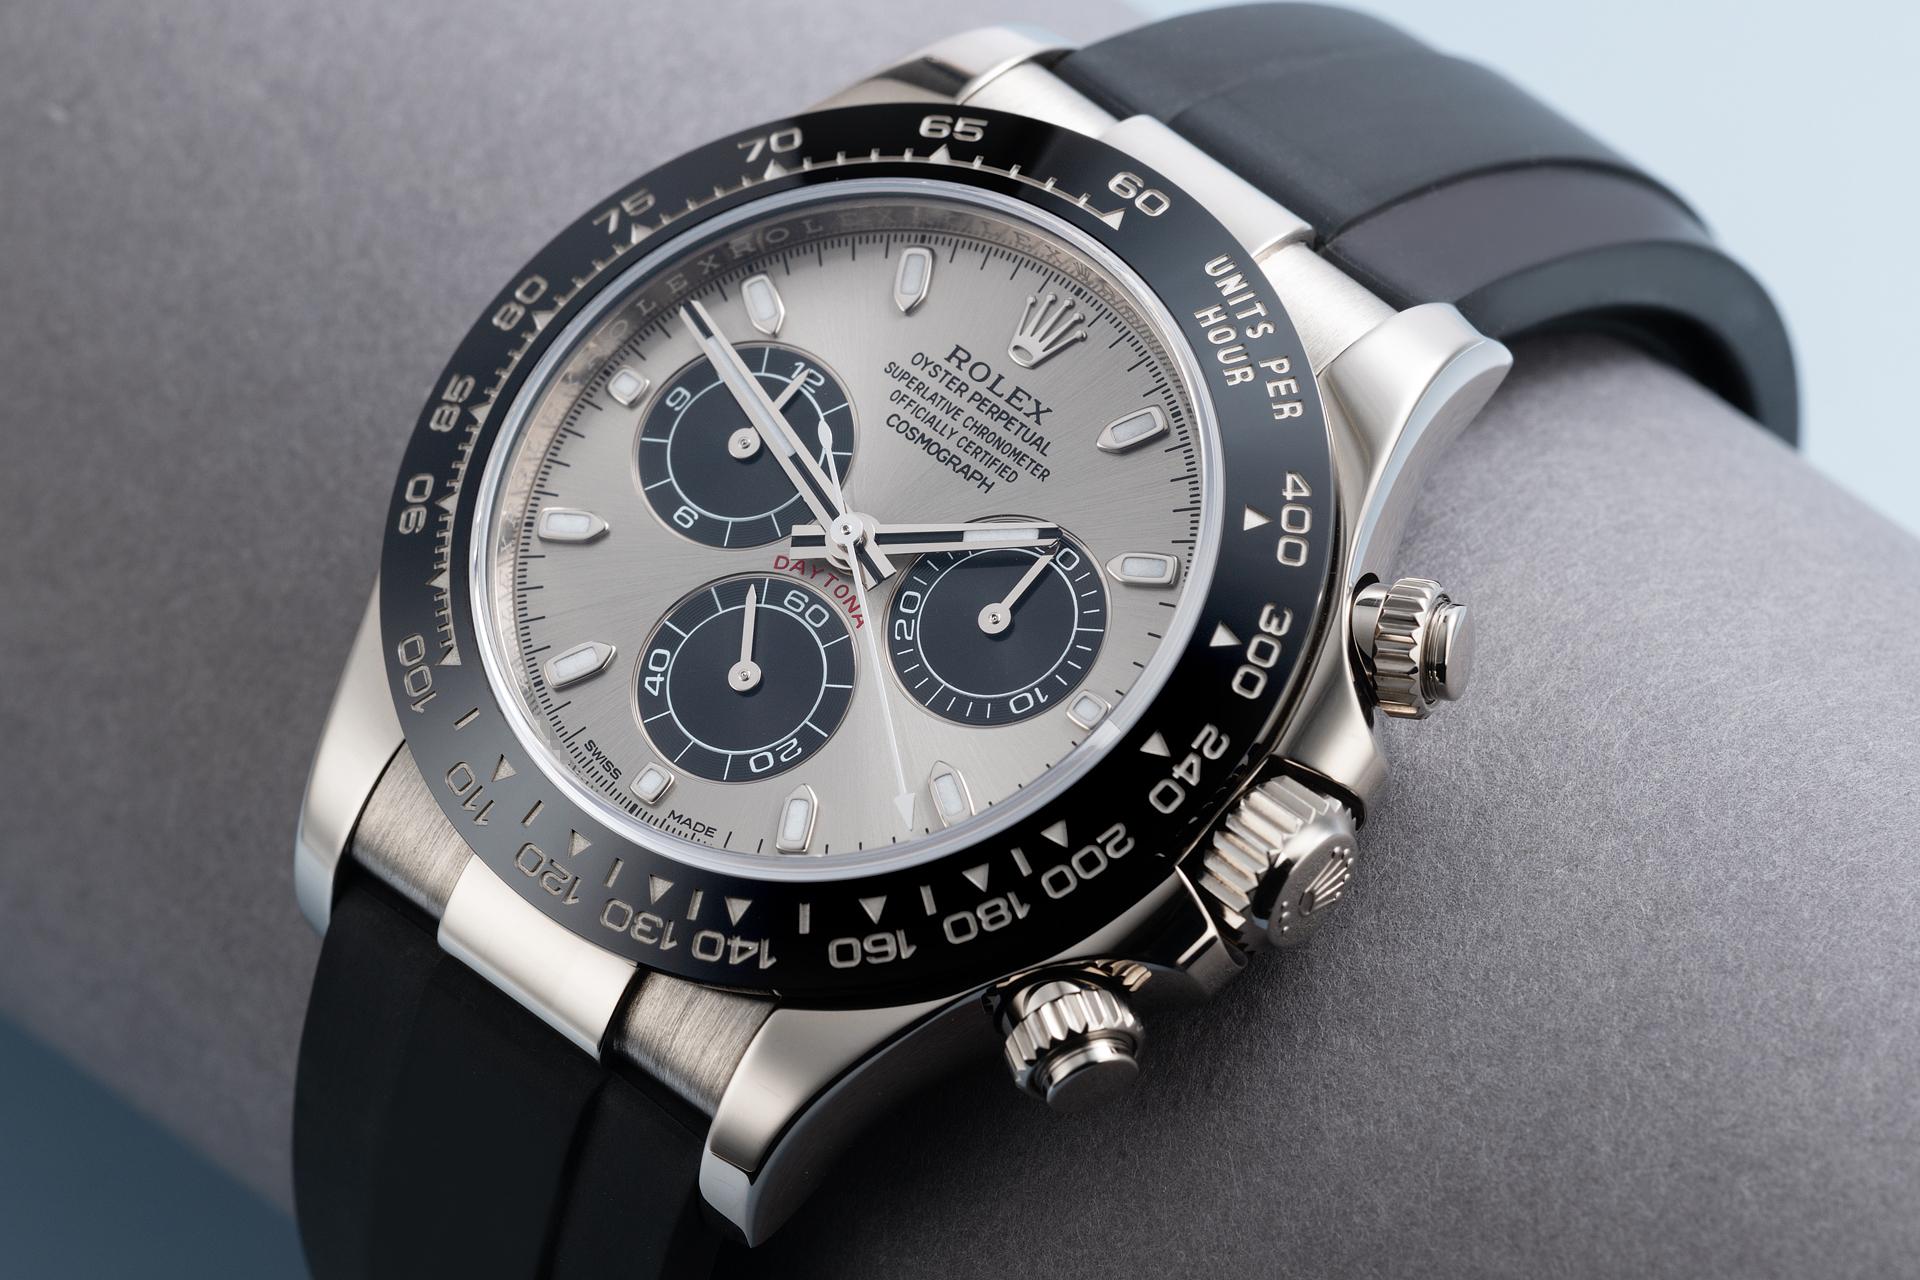 watch-club-rolex-cosmograph-daytona-white-gold-latest-model-ref-116519ln-year-2018-2-1.jpg